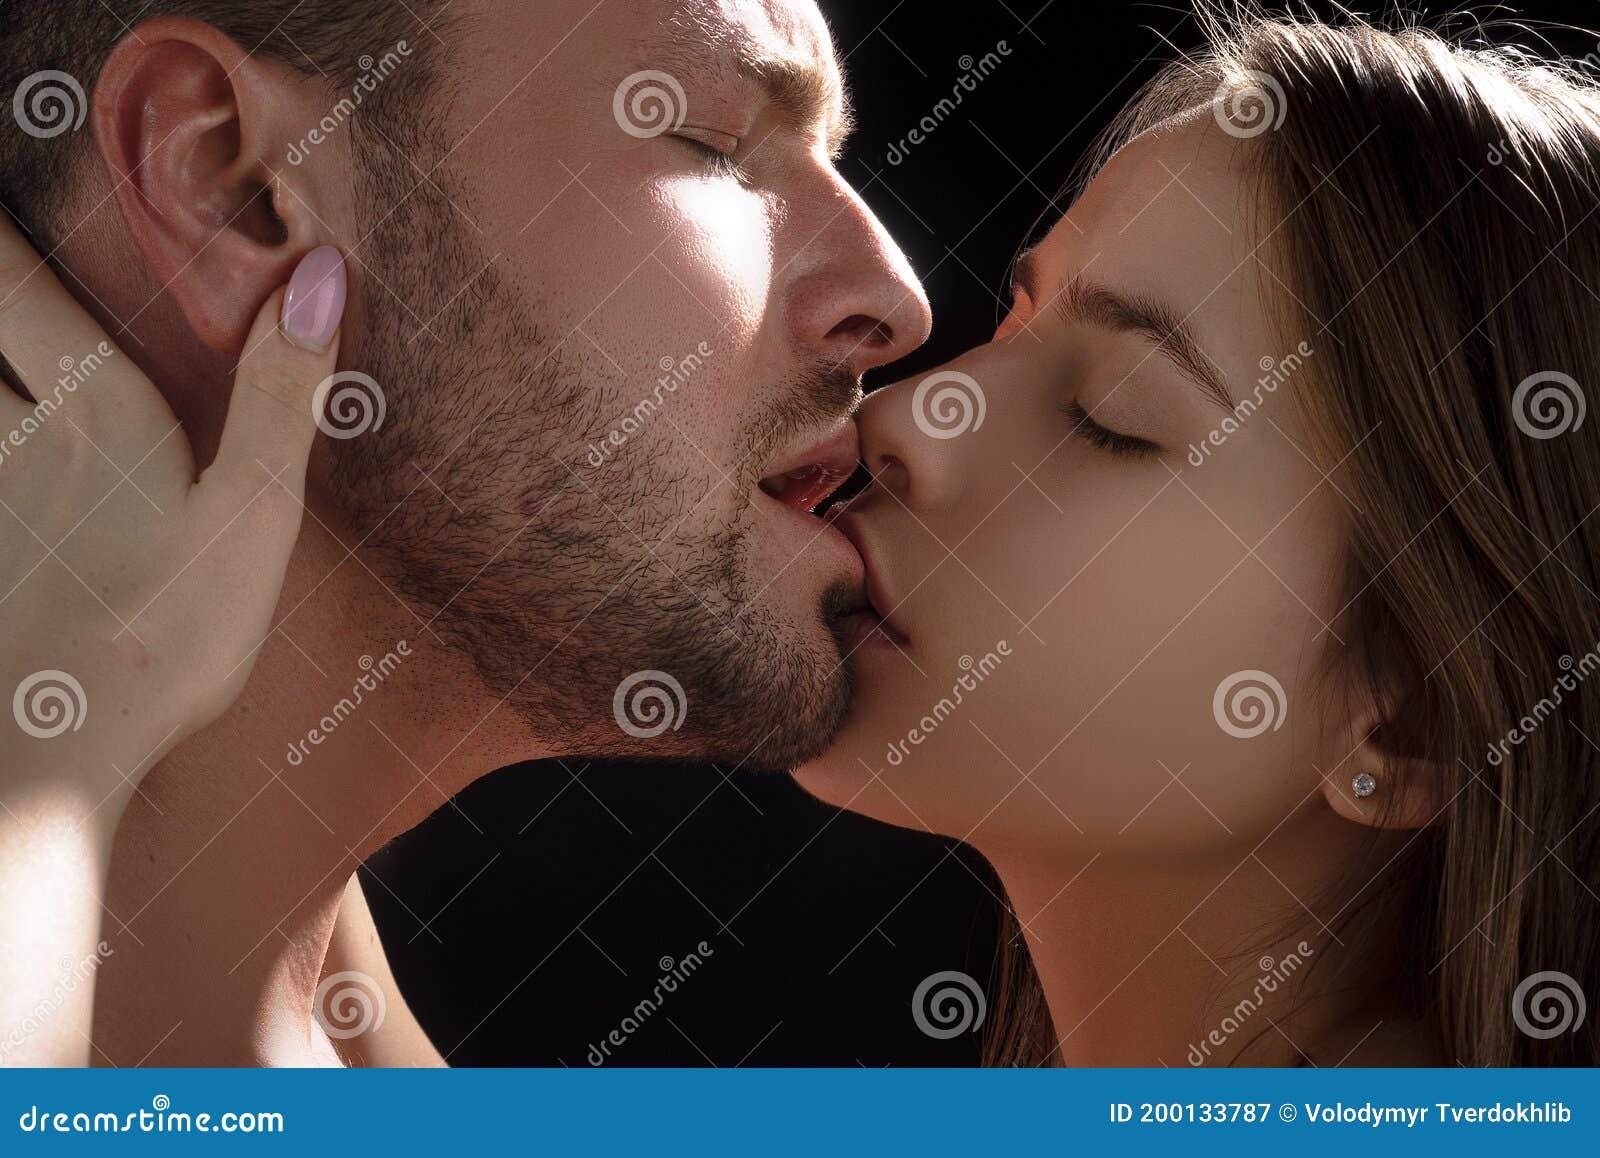 Hot Sexy Couple Kiss